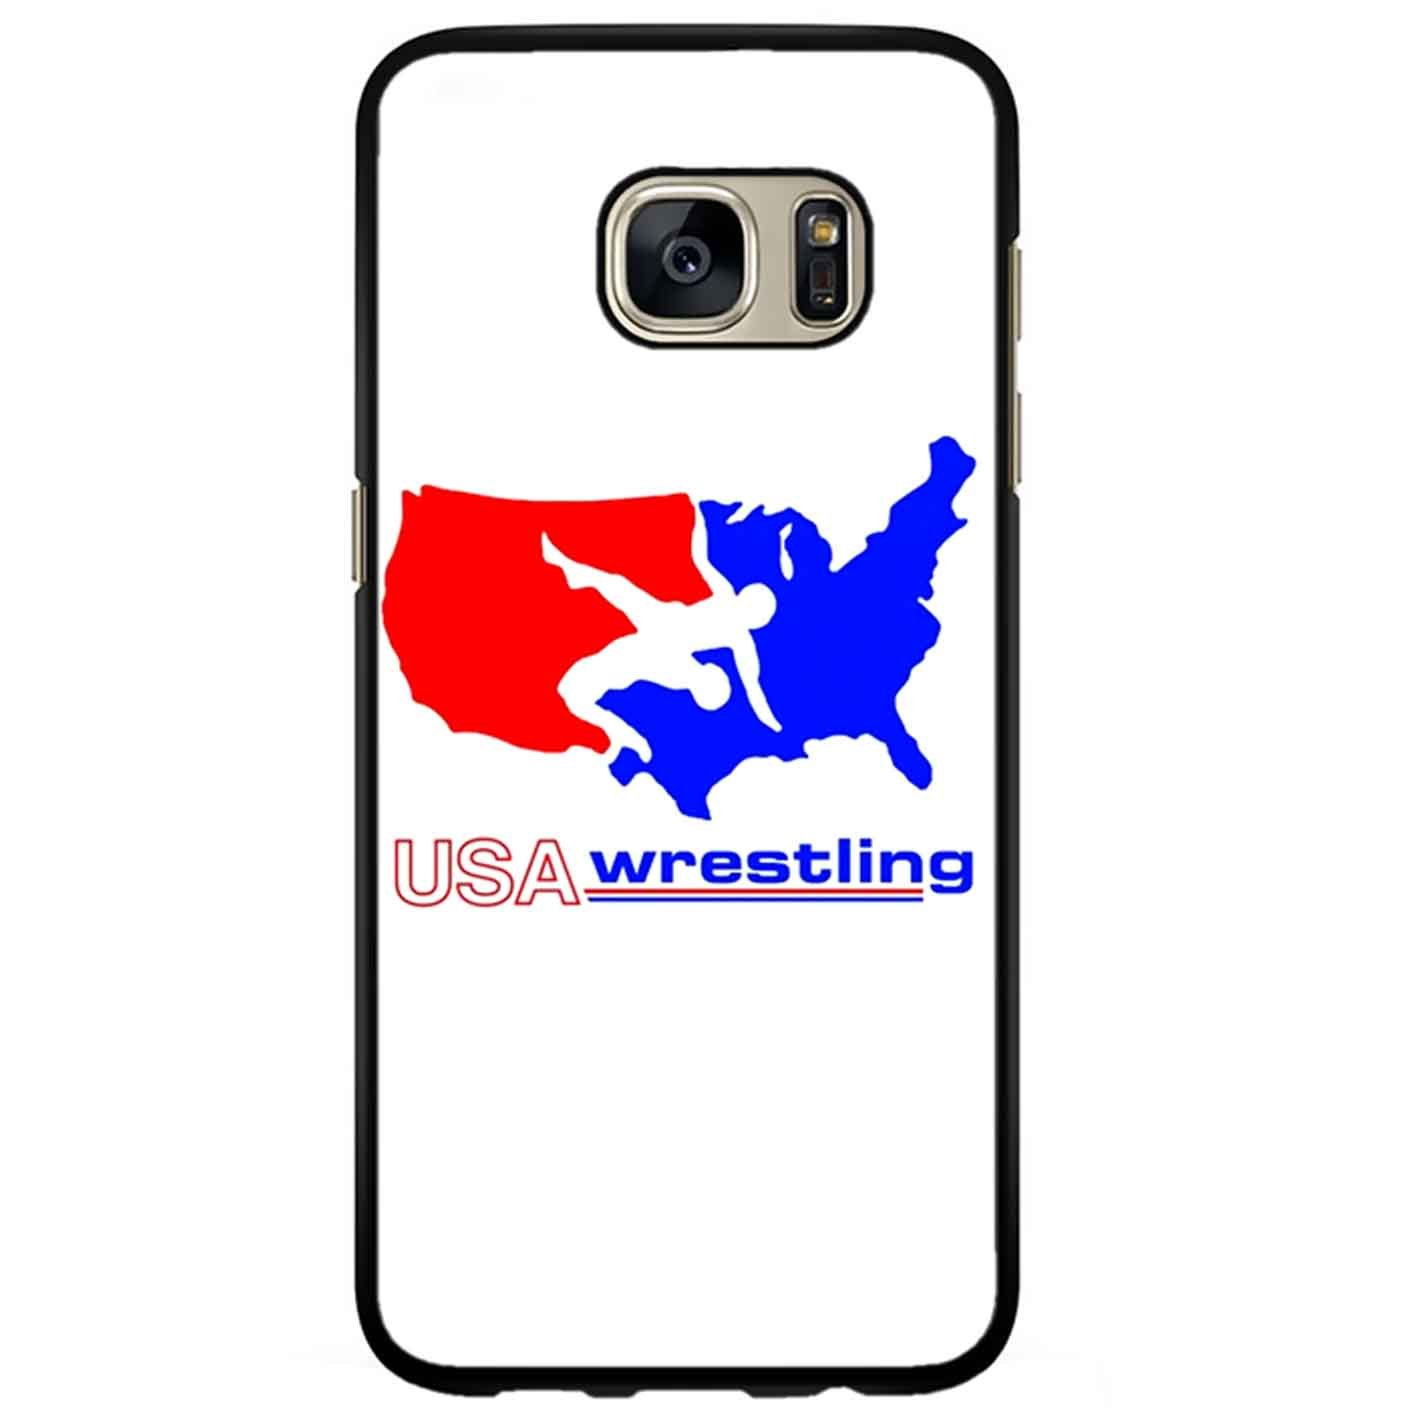 Team Usa Wrestling Cases Samsung Galaxy Note 3 8944553630869